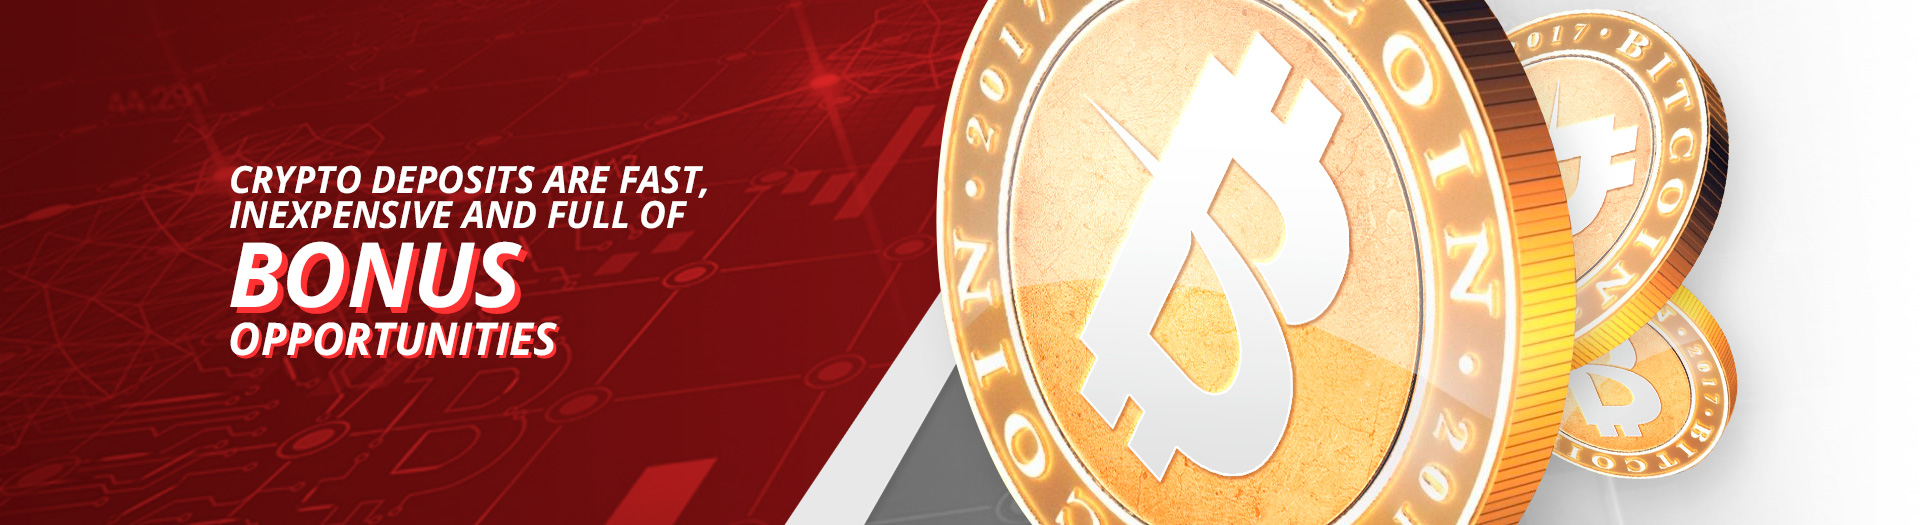 betonline bitcoin bonus di deposito